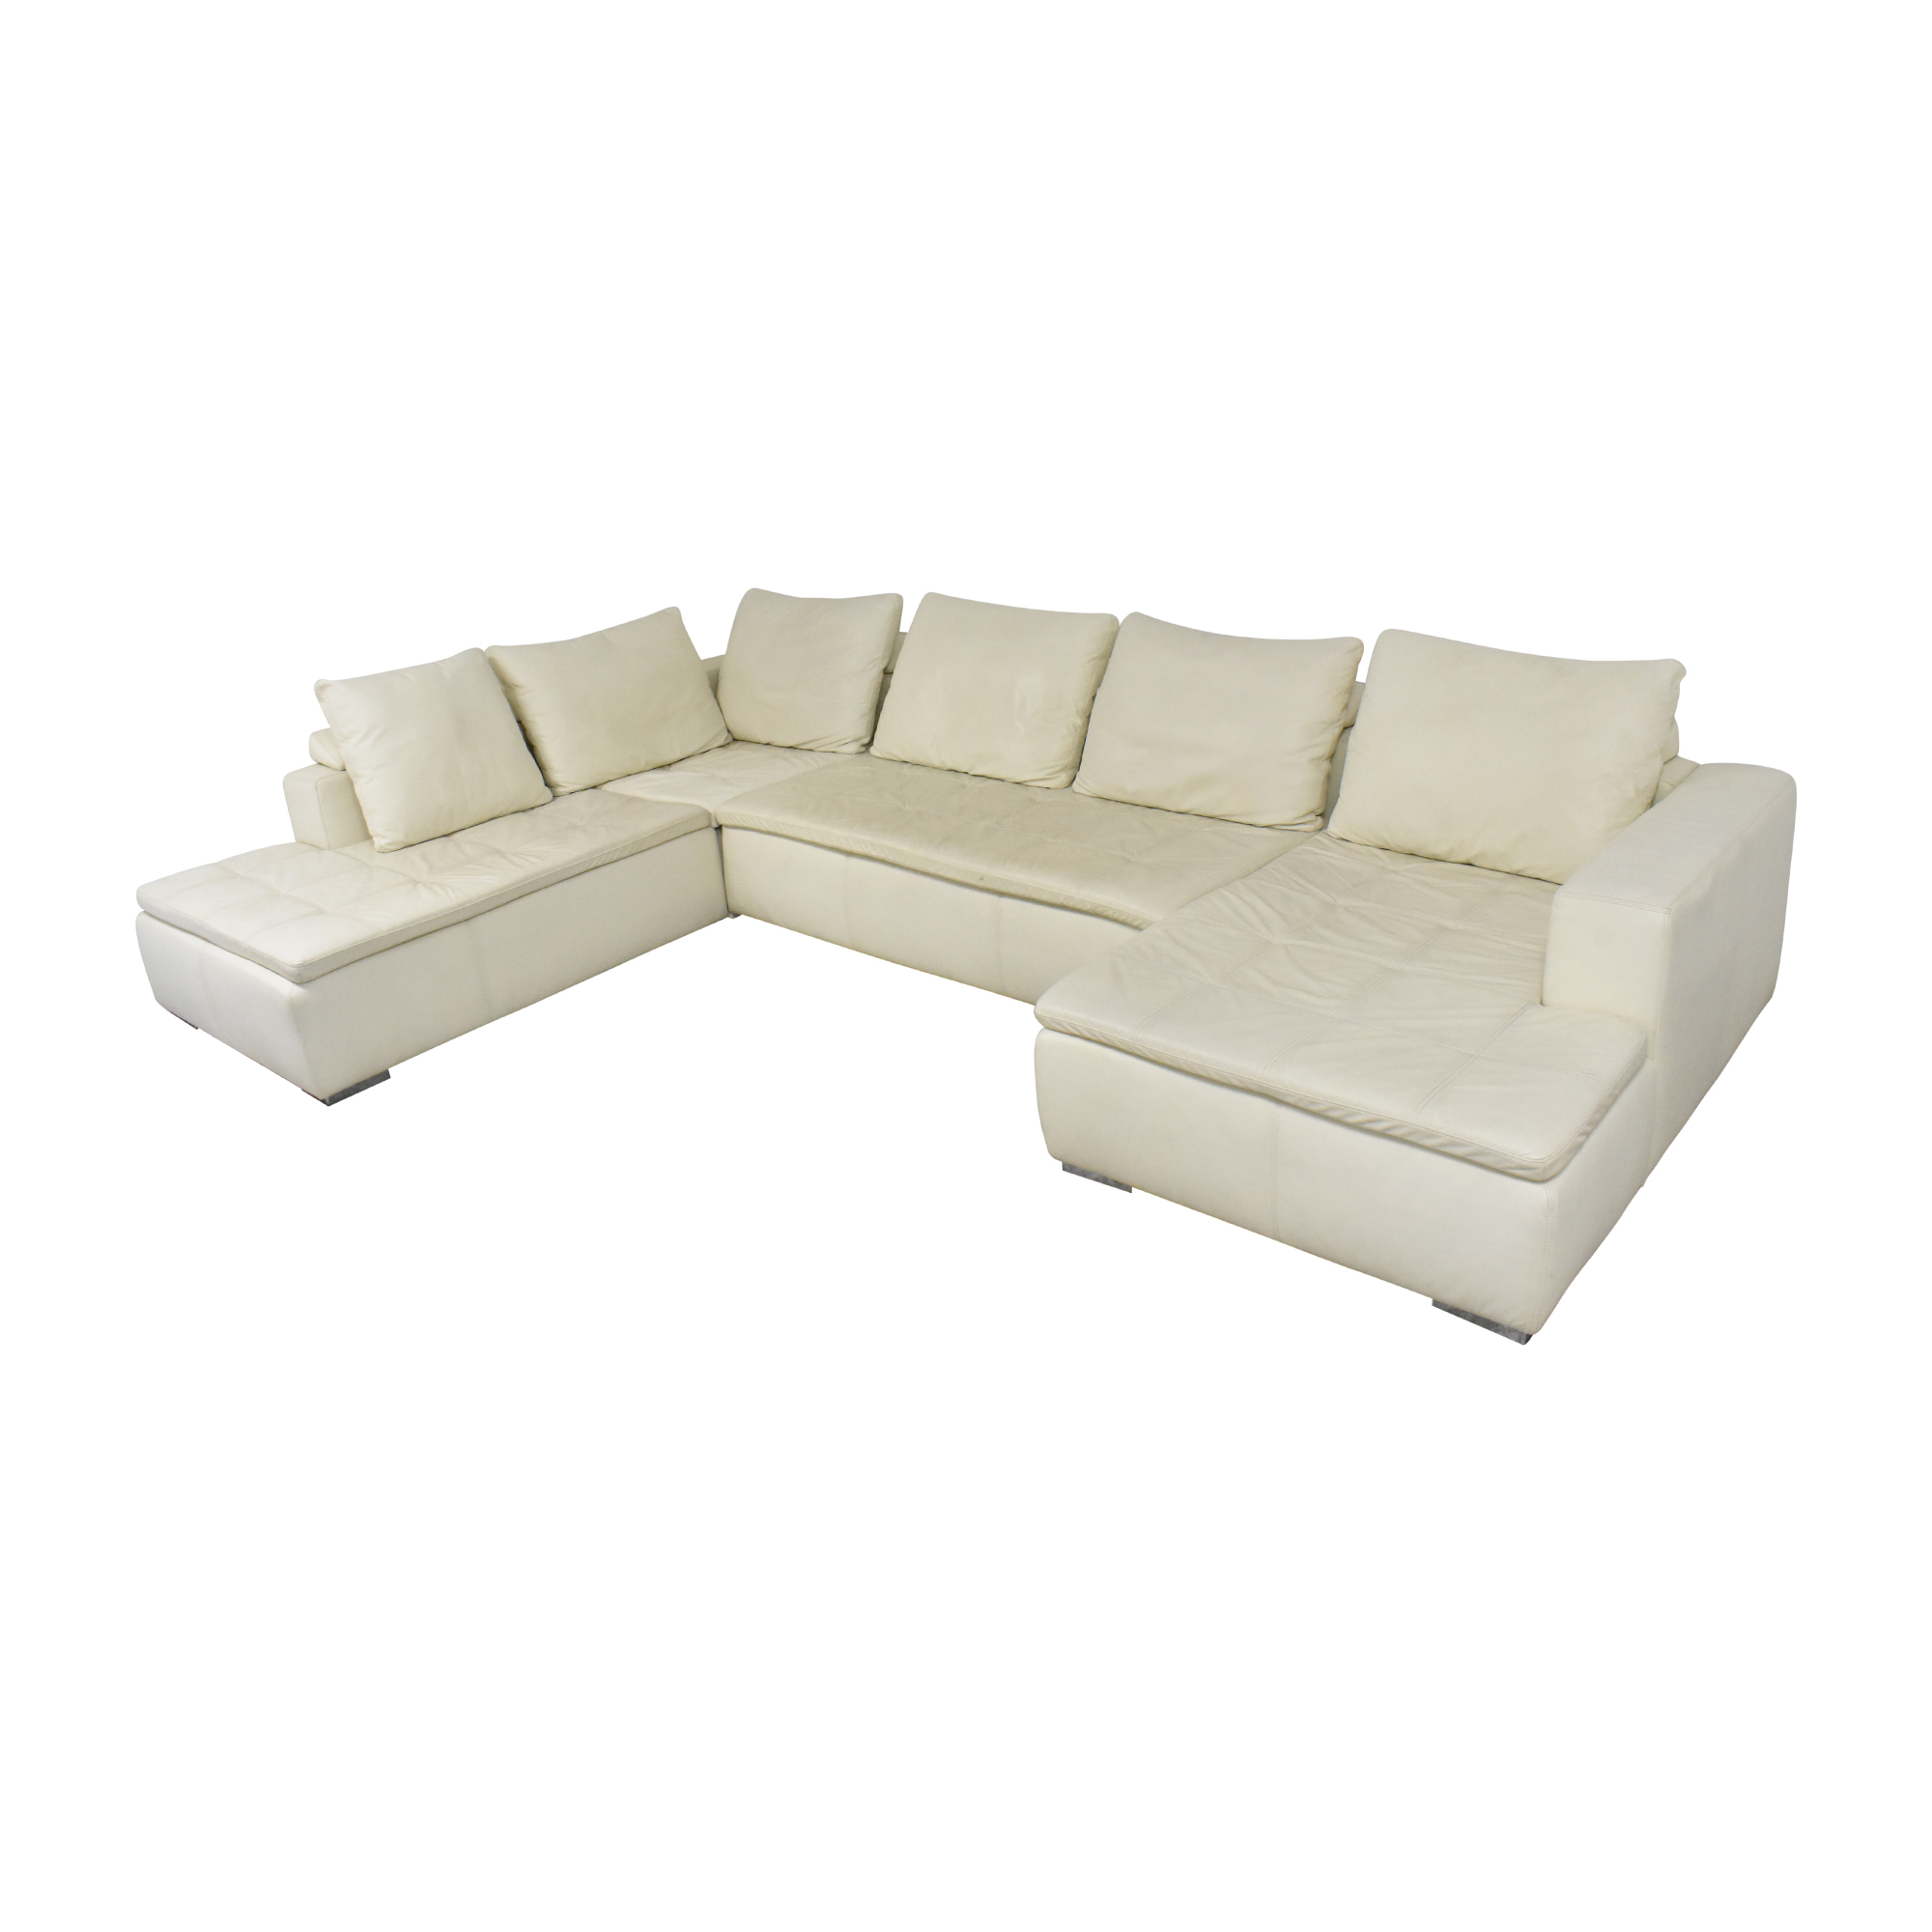 BoConcept Mezzo Sectional Sofa / Sectionals